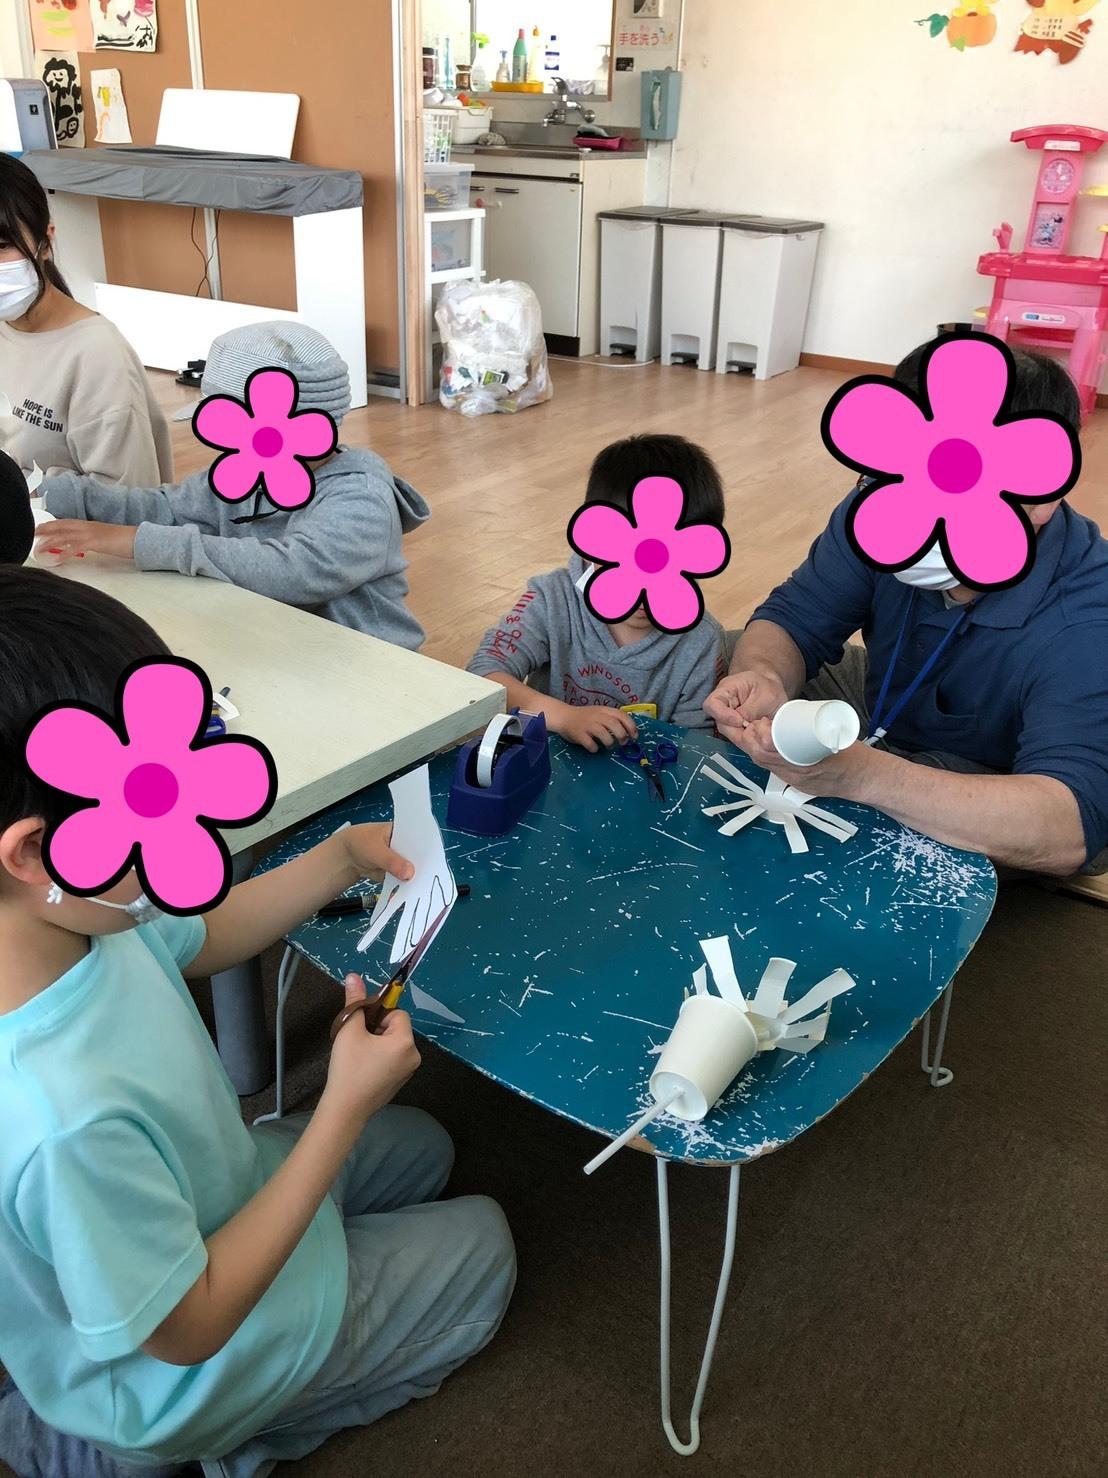 S__12115996.jpg